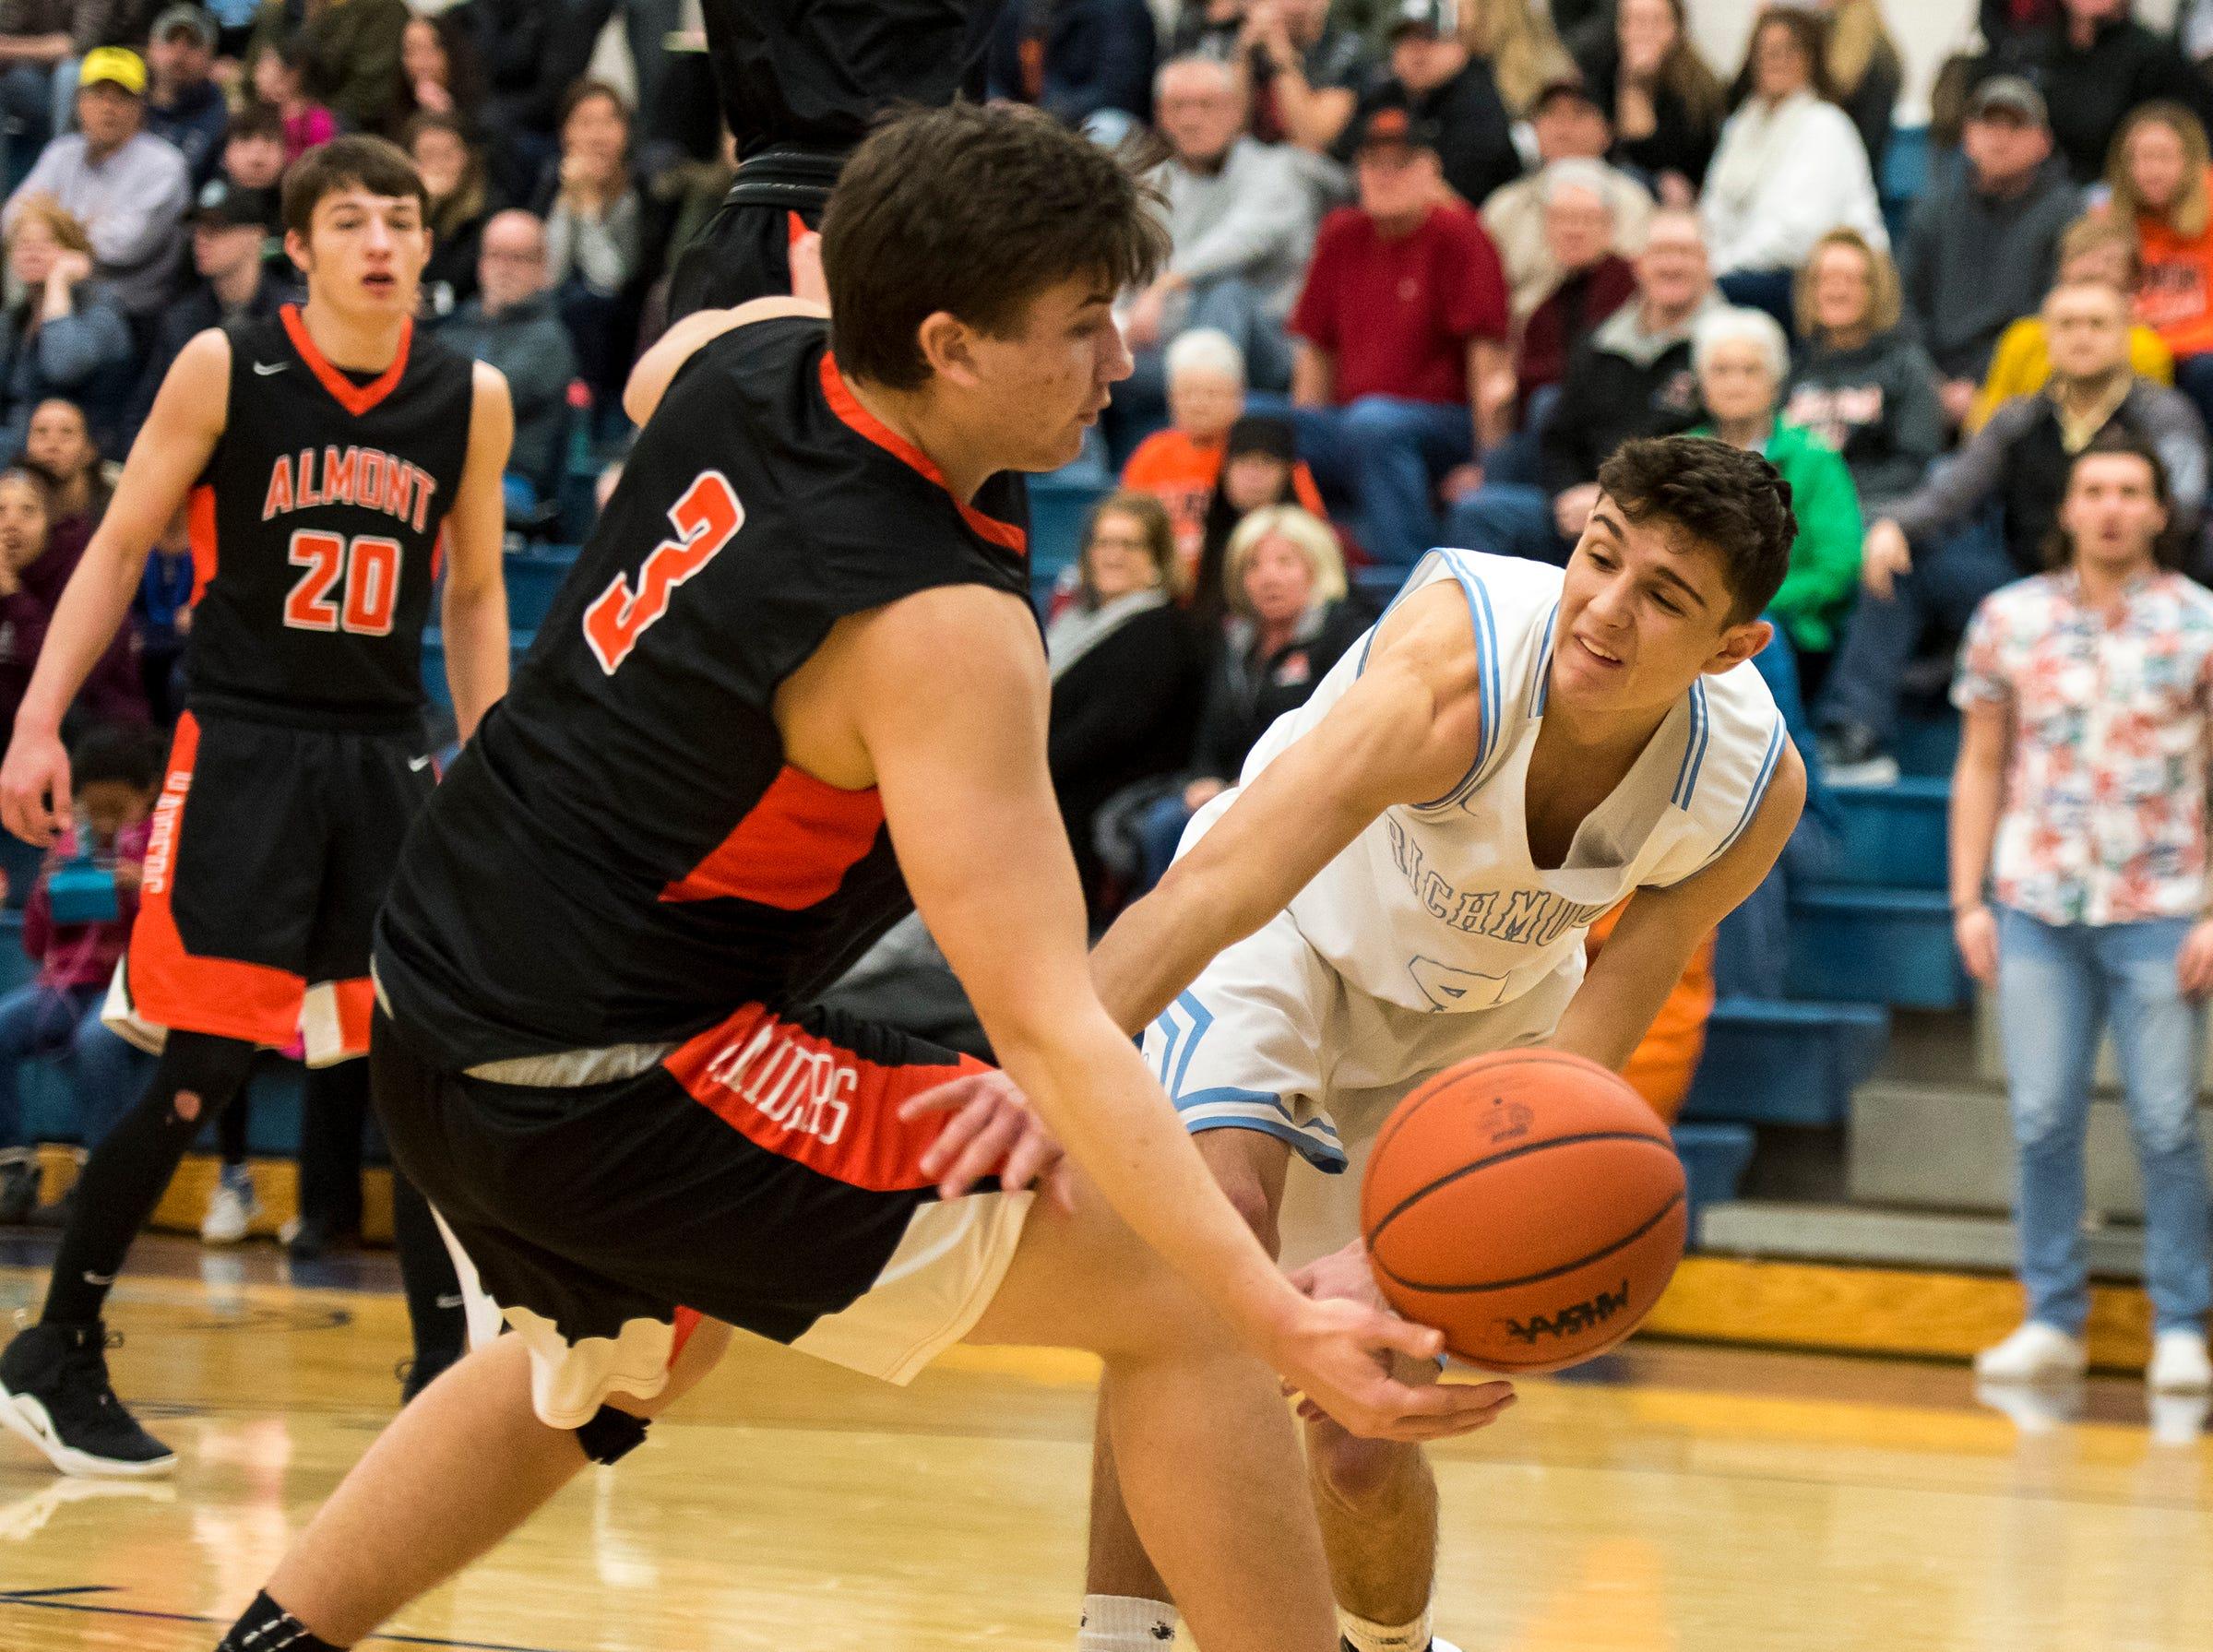 Almont High School guard Gabe Bourdeau (3) blocks a pass by Richmond guard Brandon Schorman during their basketball game Friday, Feb. 15, 2019 at Richmond High School.